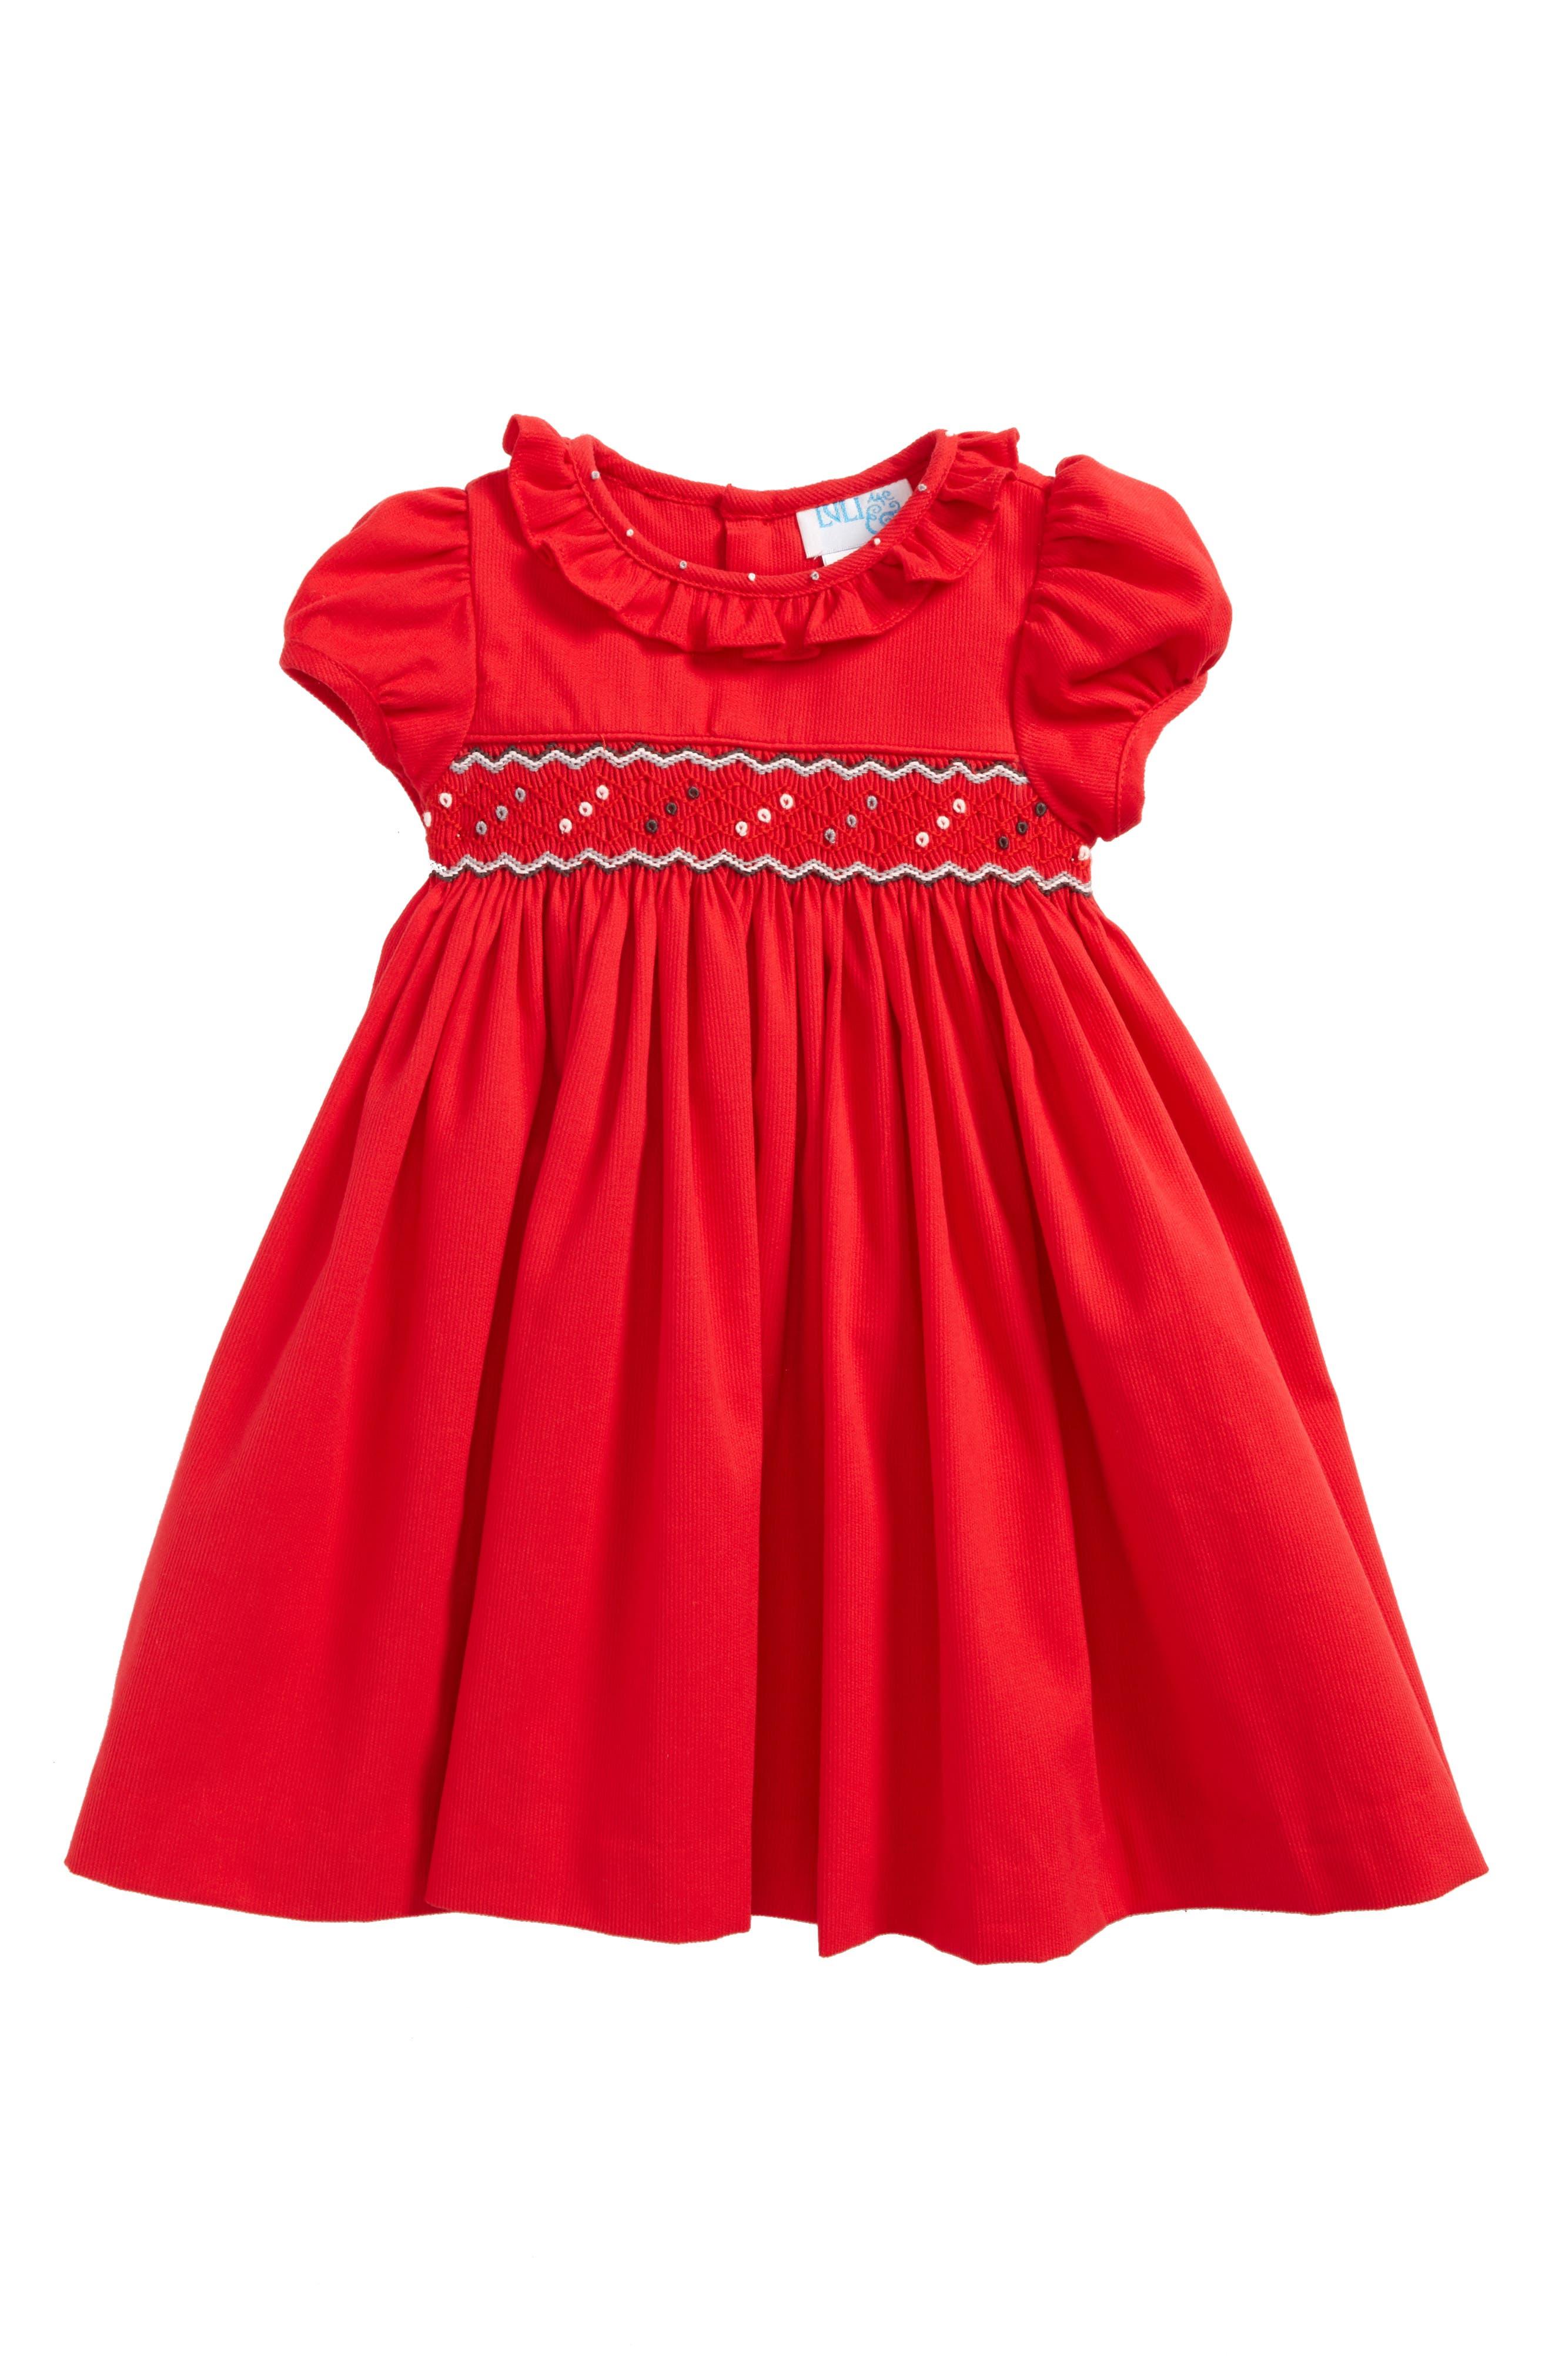 Main Image - Luli & Me Smocked Dress (Baby Girls)